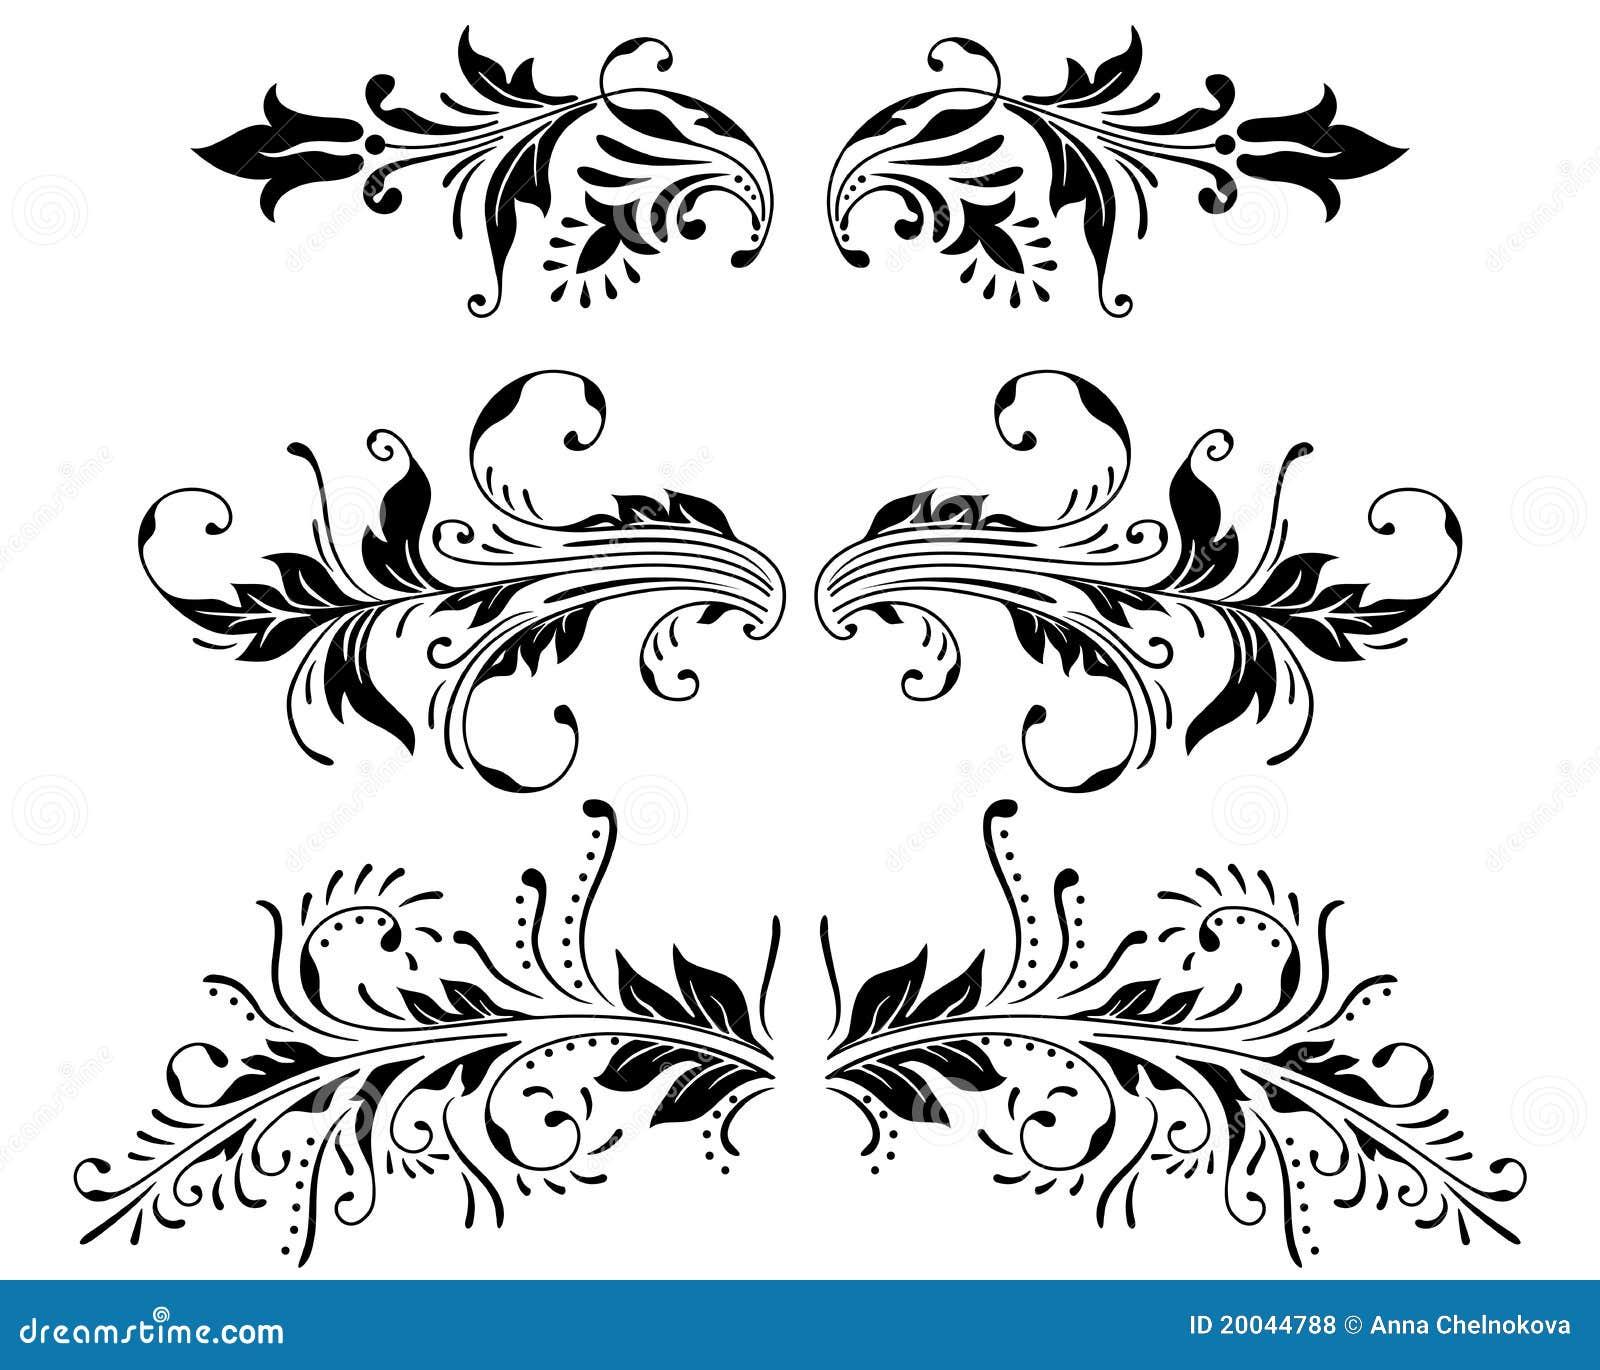 Line Art Design Vector Free Download : Ornament vector elements stock illustration of